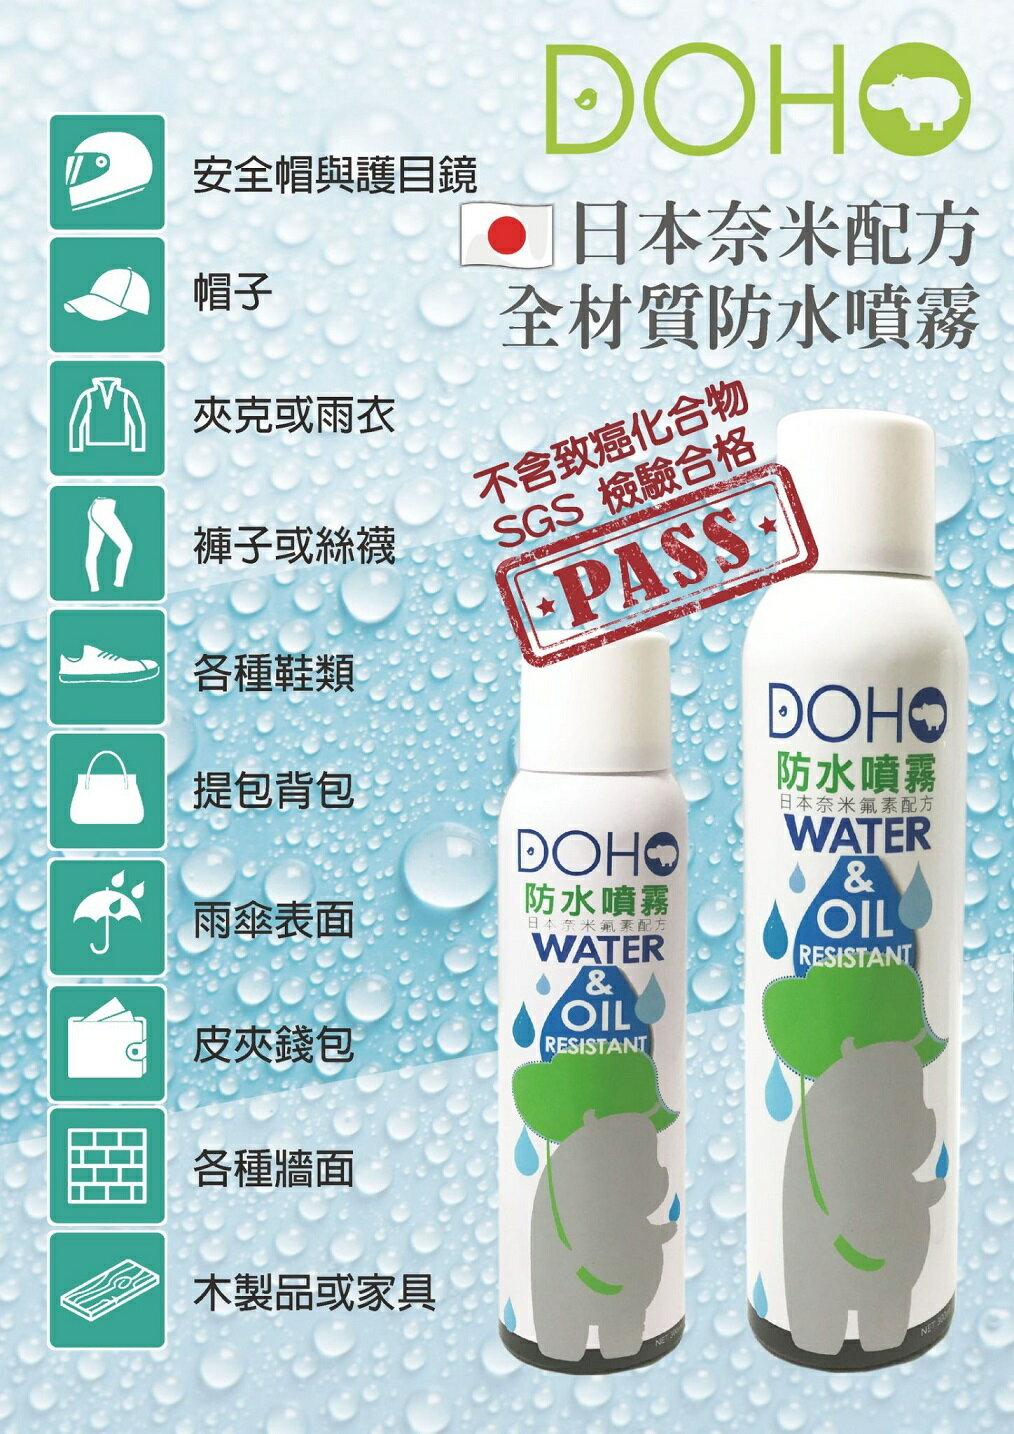 DOHO 日本奈米防水噴霧 - 大罐(300ML)